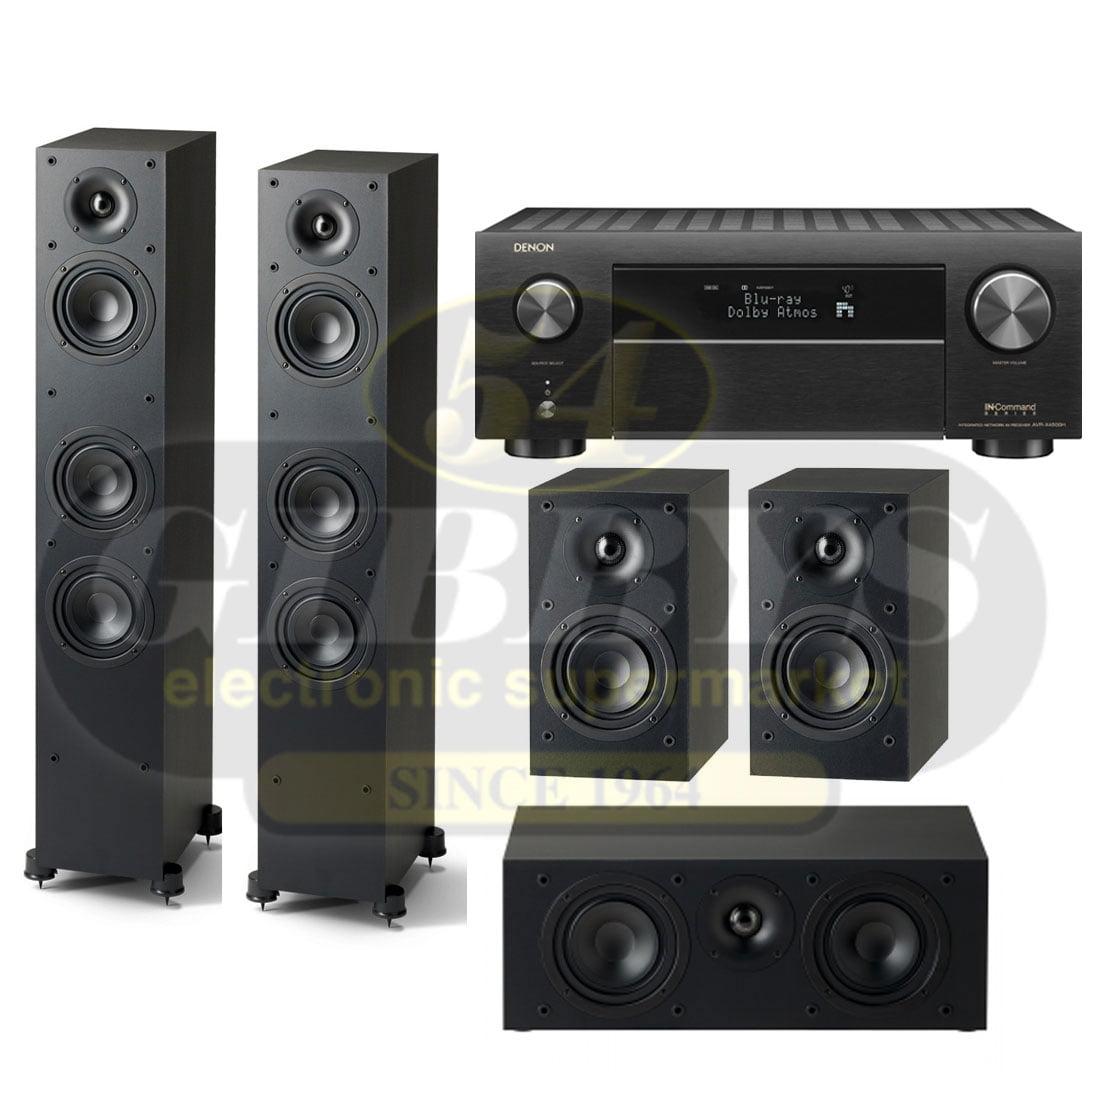 Denon AVR-X4500H 9 2-Channel Network A/V Receiver | Paradigm Monitor SE 5 0  Speaker Bundle 3